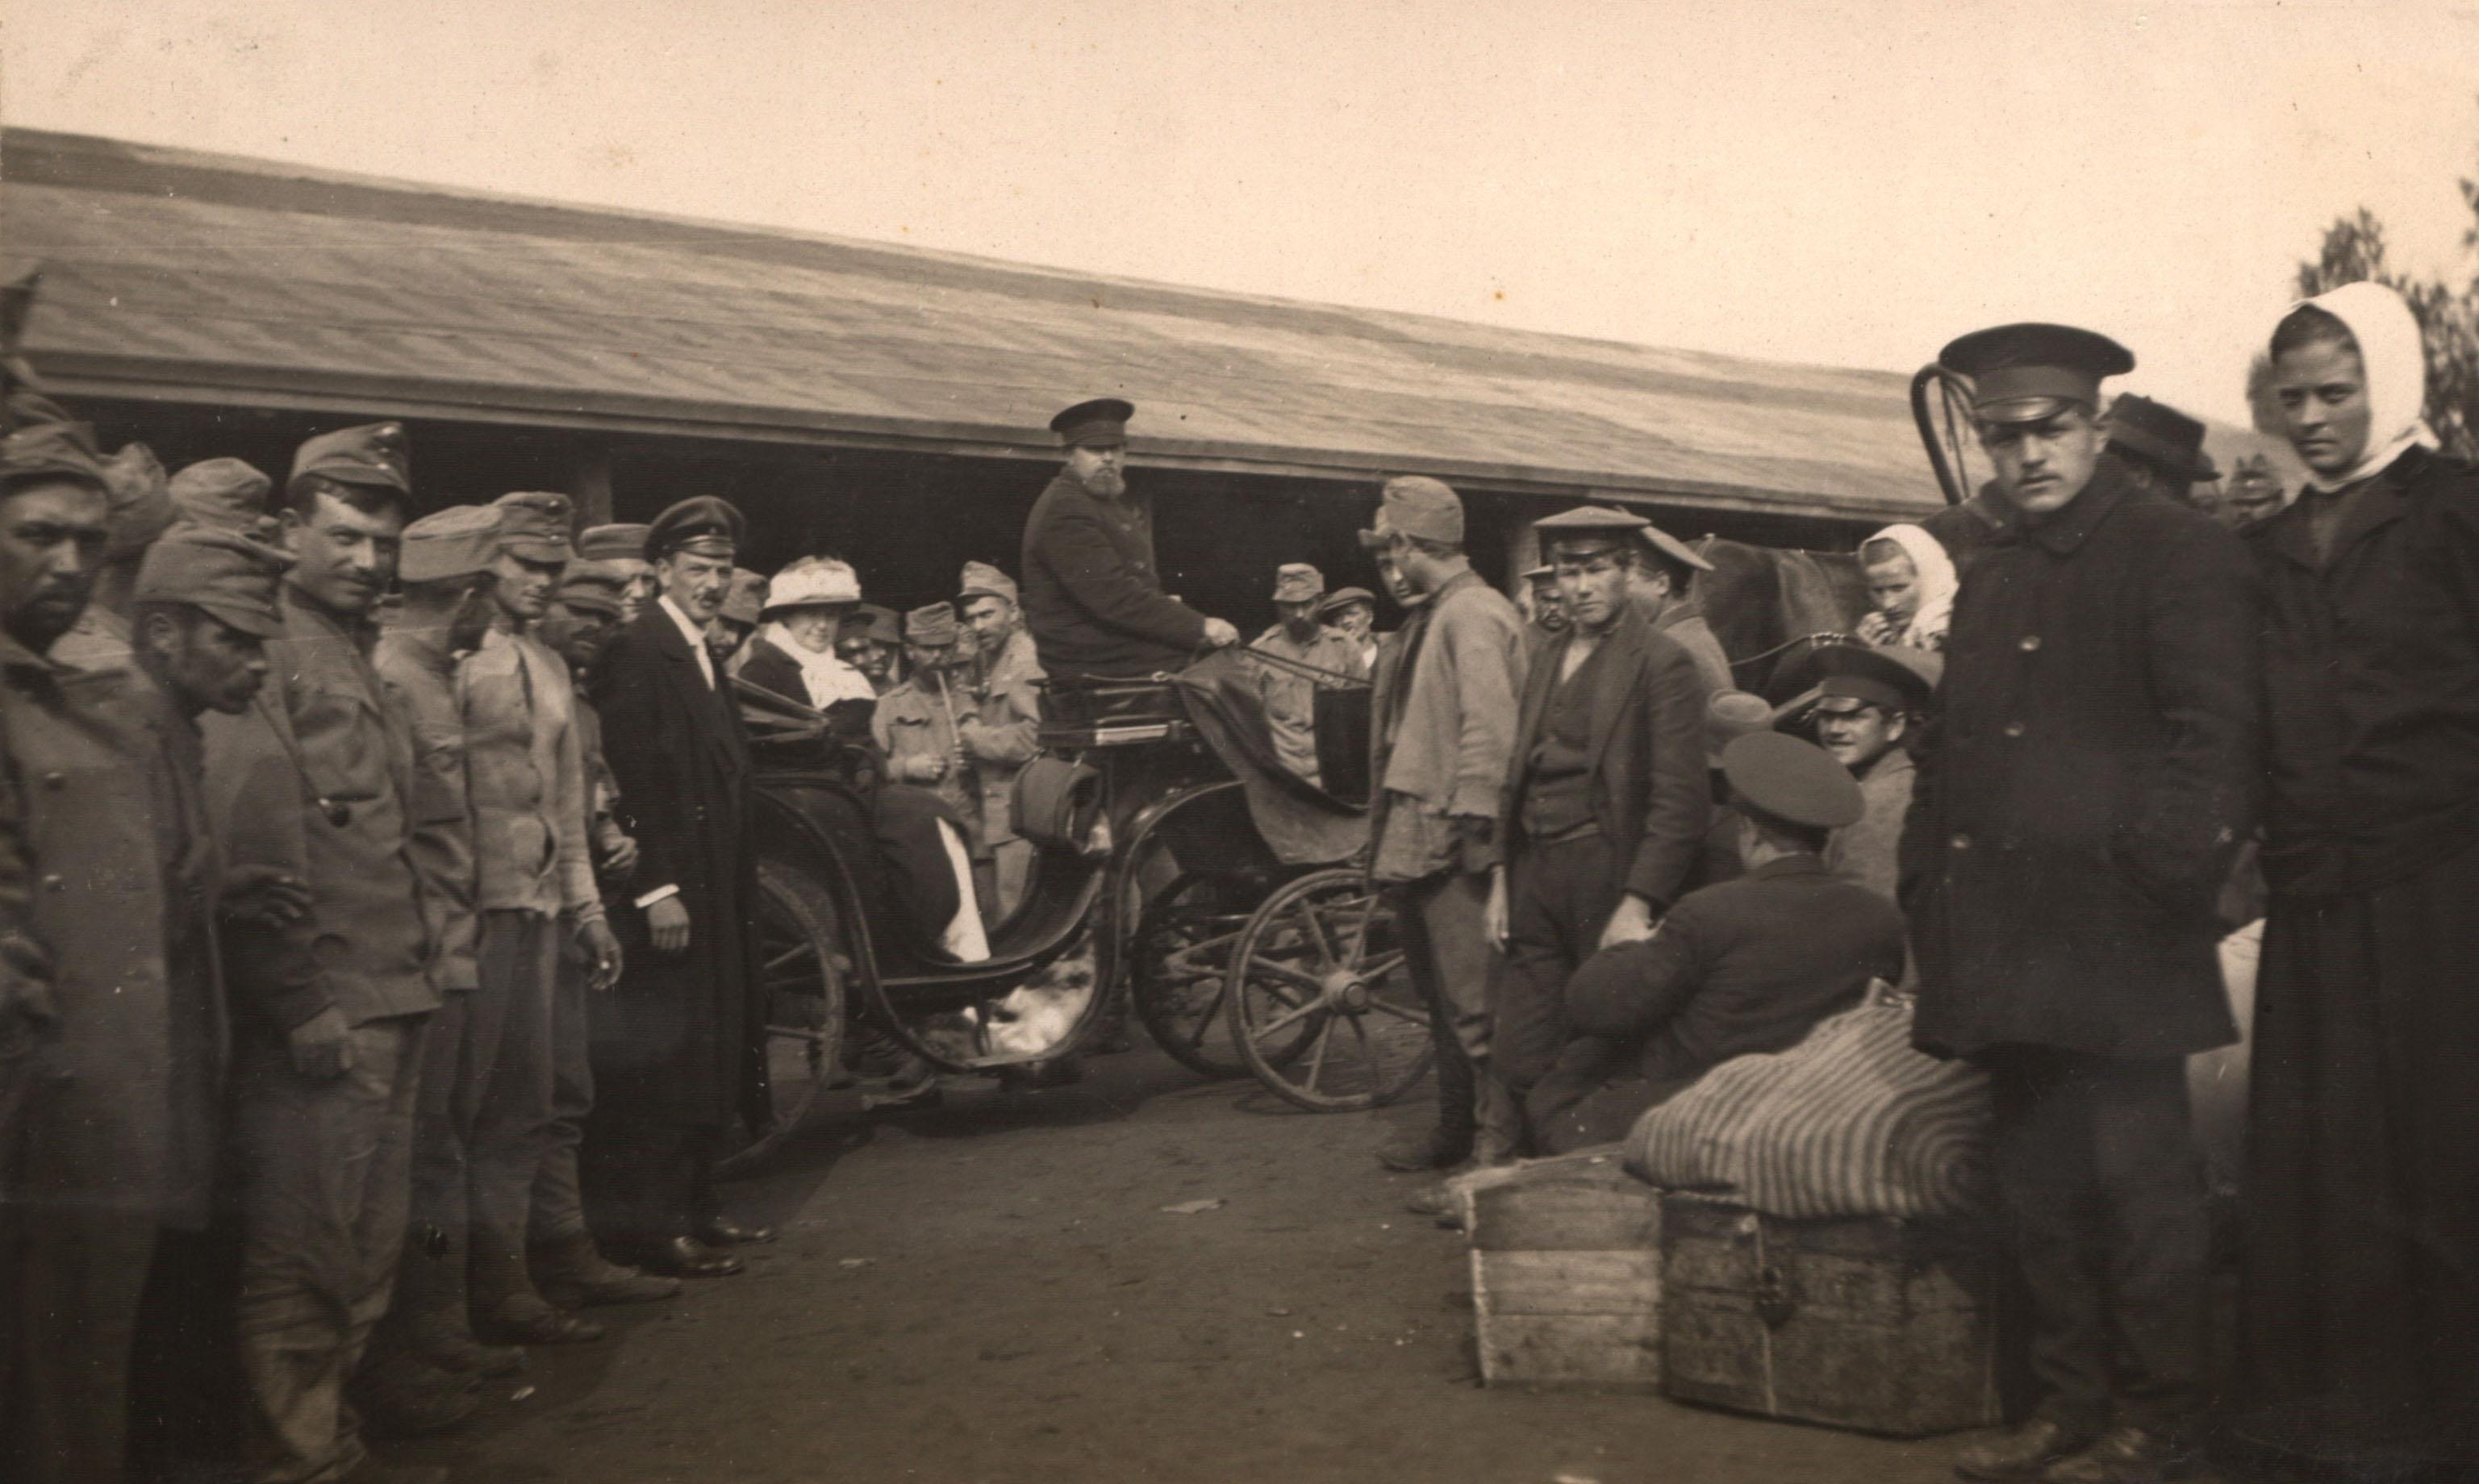 Встреча беженцев на железнодорожном вокзале. 1915